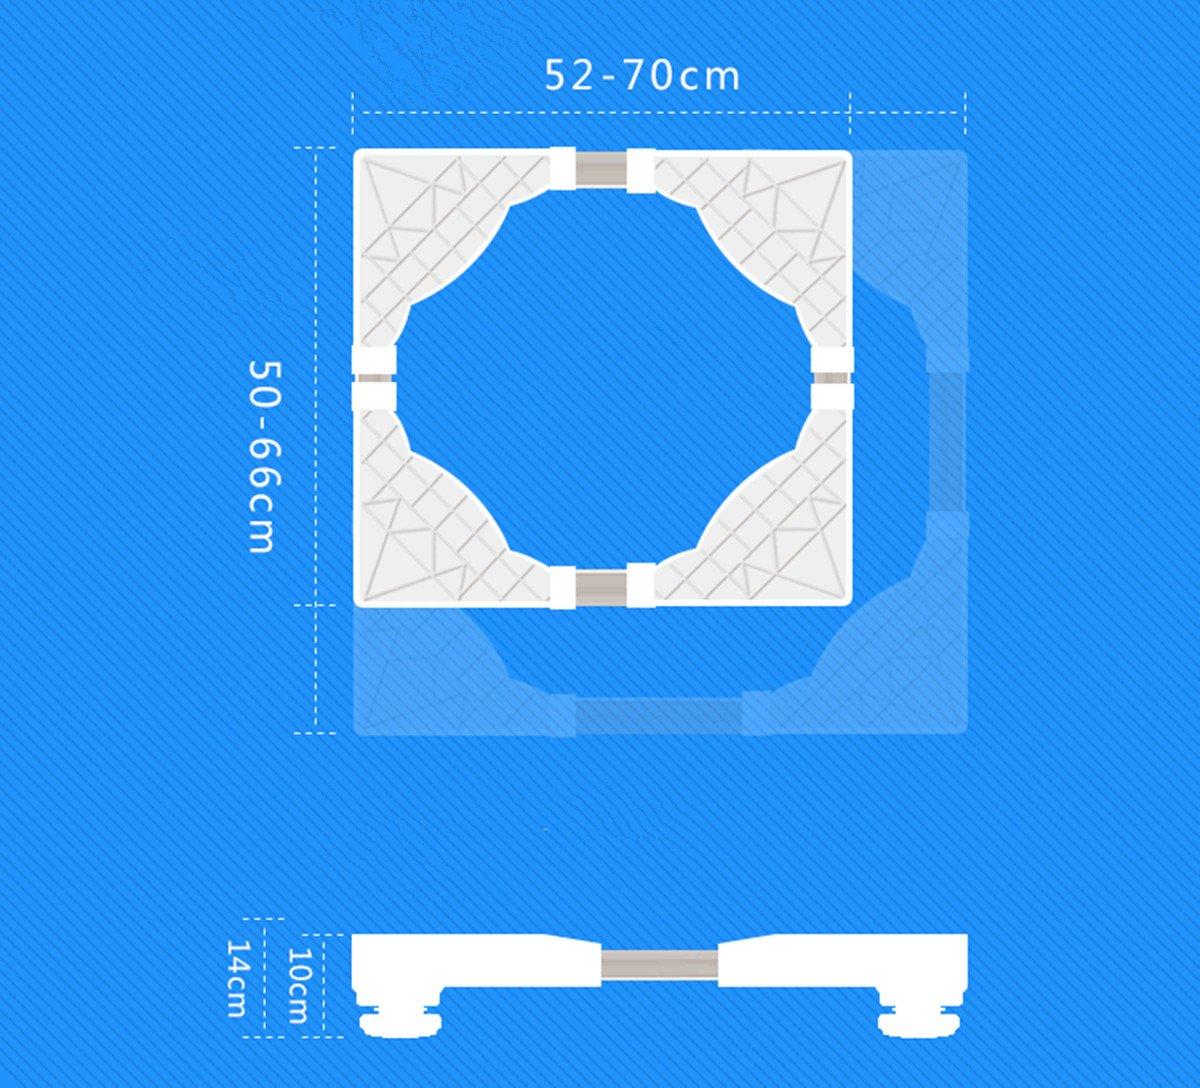 K/ühlschr/änke Waschmaschine Sockel K/ühlschrank Basis Verstellbare Sockel mit 4 Verstellbar F/ü/ße Waschmaschine Bodenrahmen K/ühlschrank H/öhenverstellbare Halterung Waschmaschine Basis F/ür Trockner